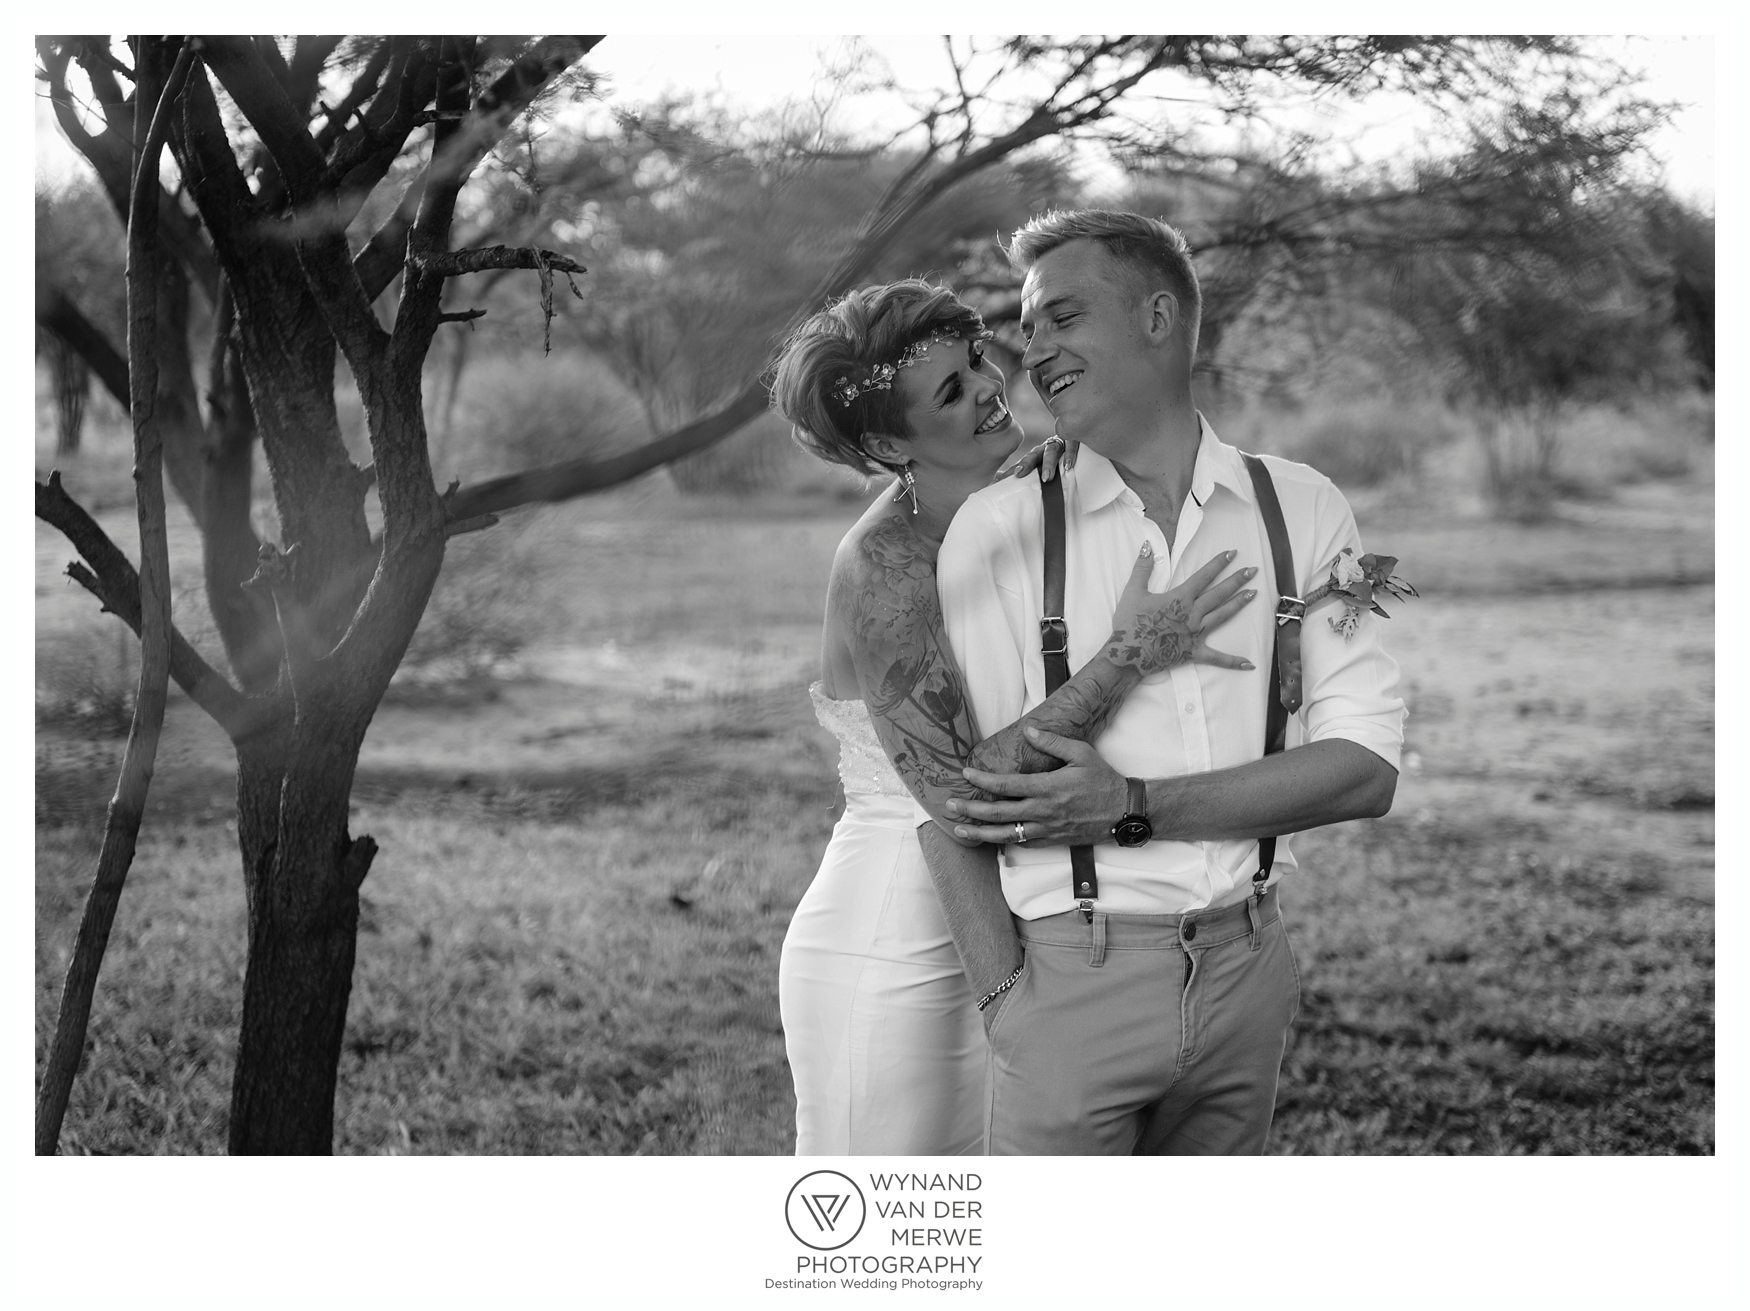 WynandvanderMerwe_weddingphotography_bushveldwedding_northam_bushveld_limpopowedding_limpopo_southafrica-242.jpg